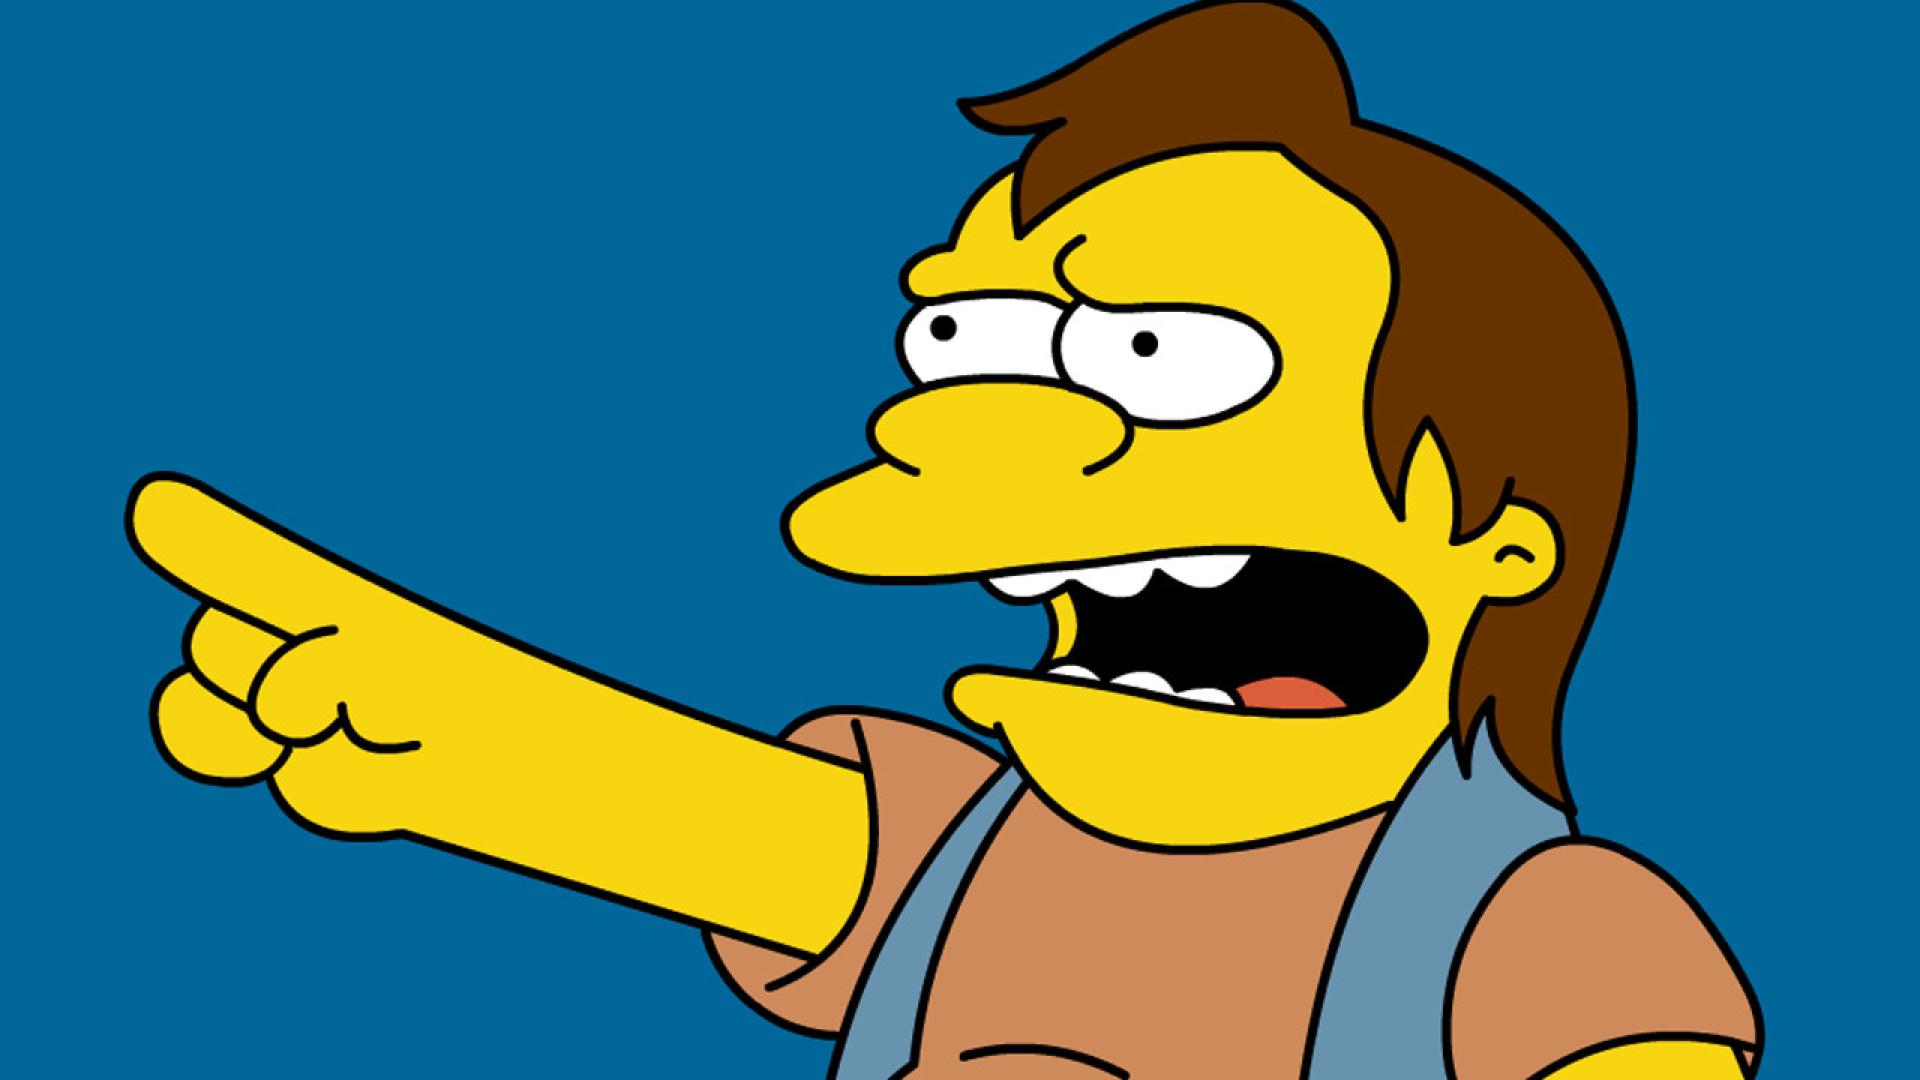 Simpsons Wallpaper HD 8